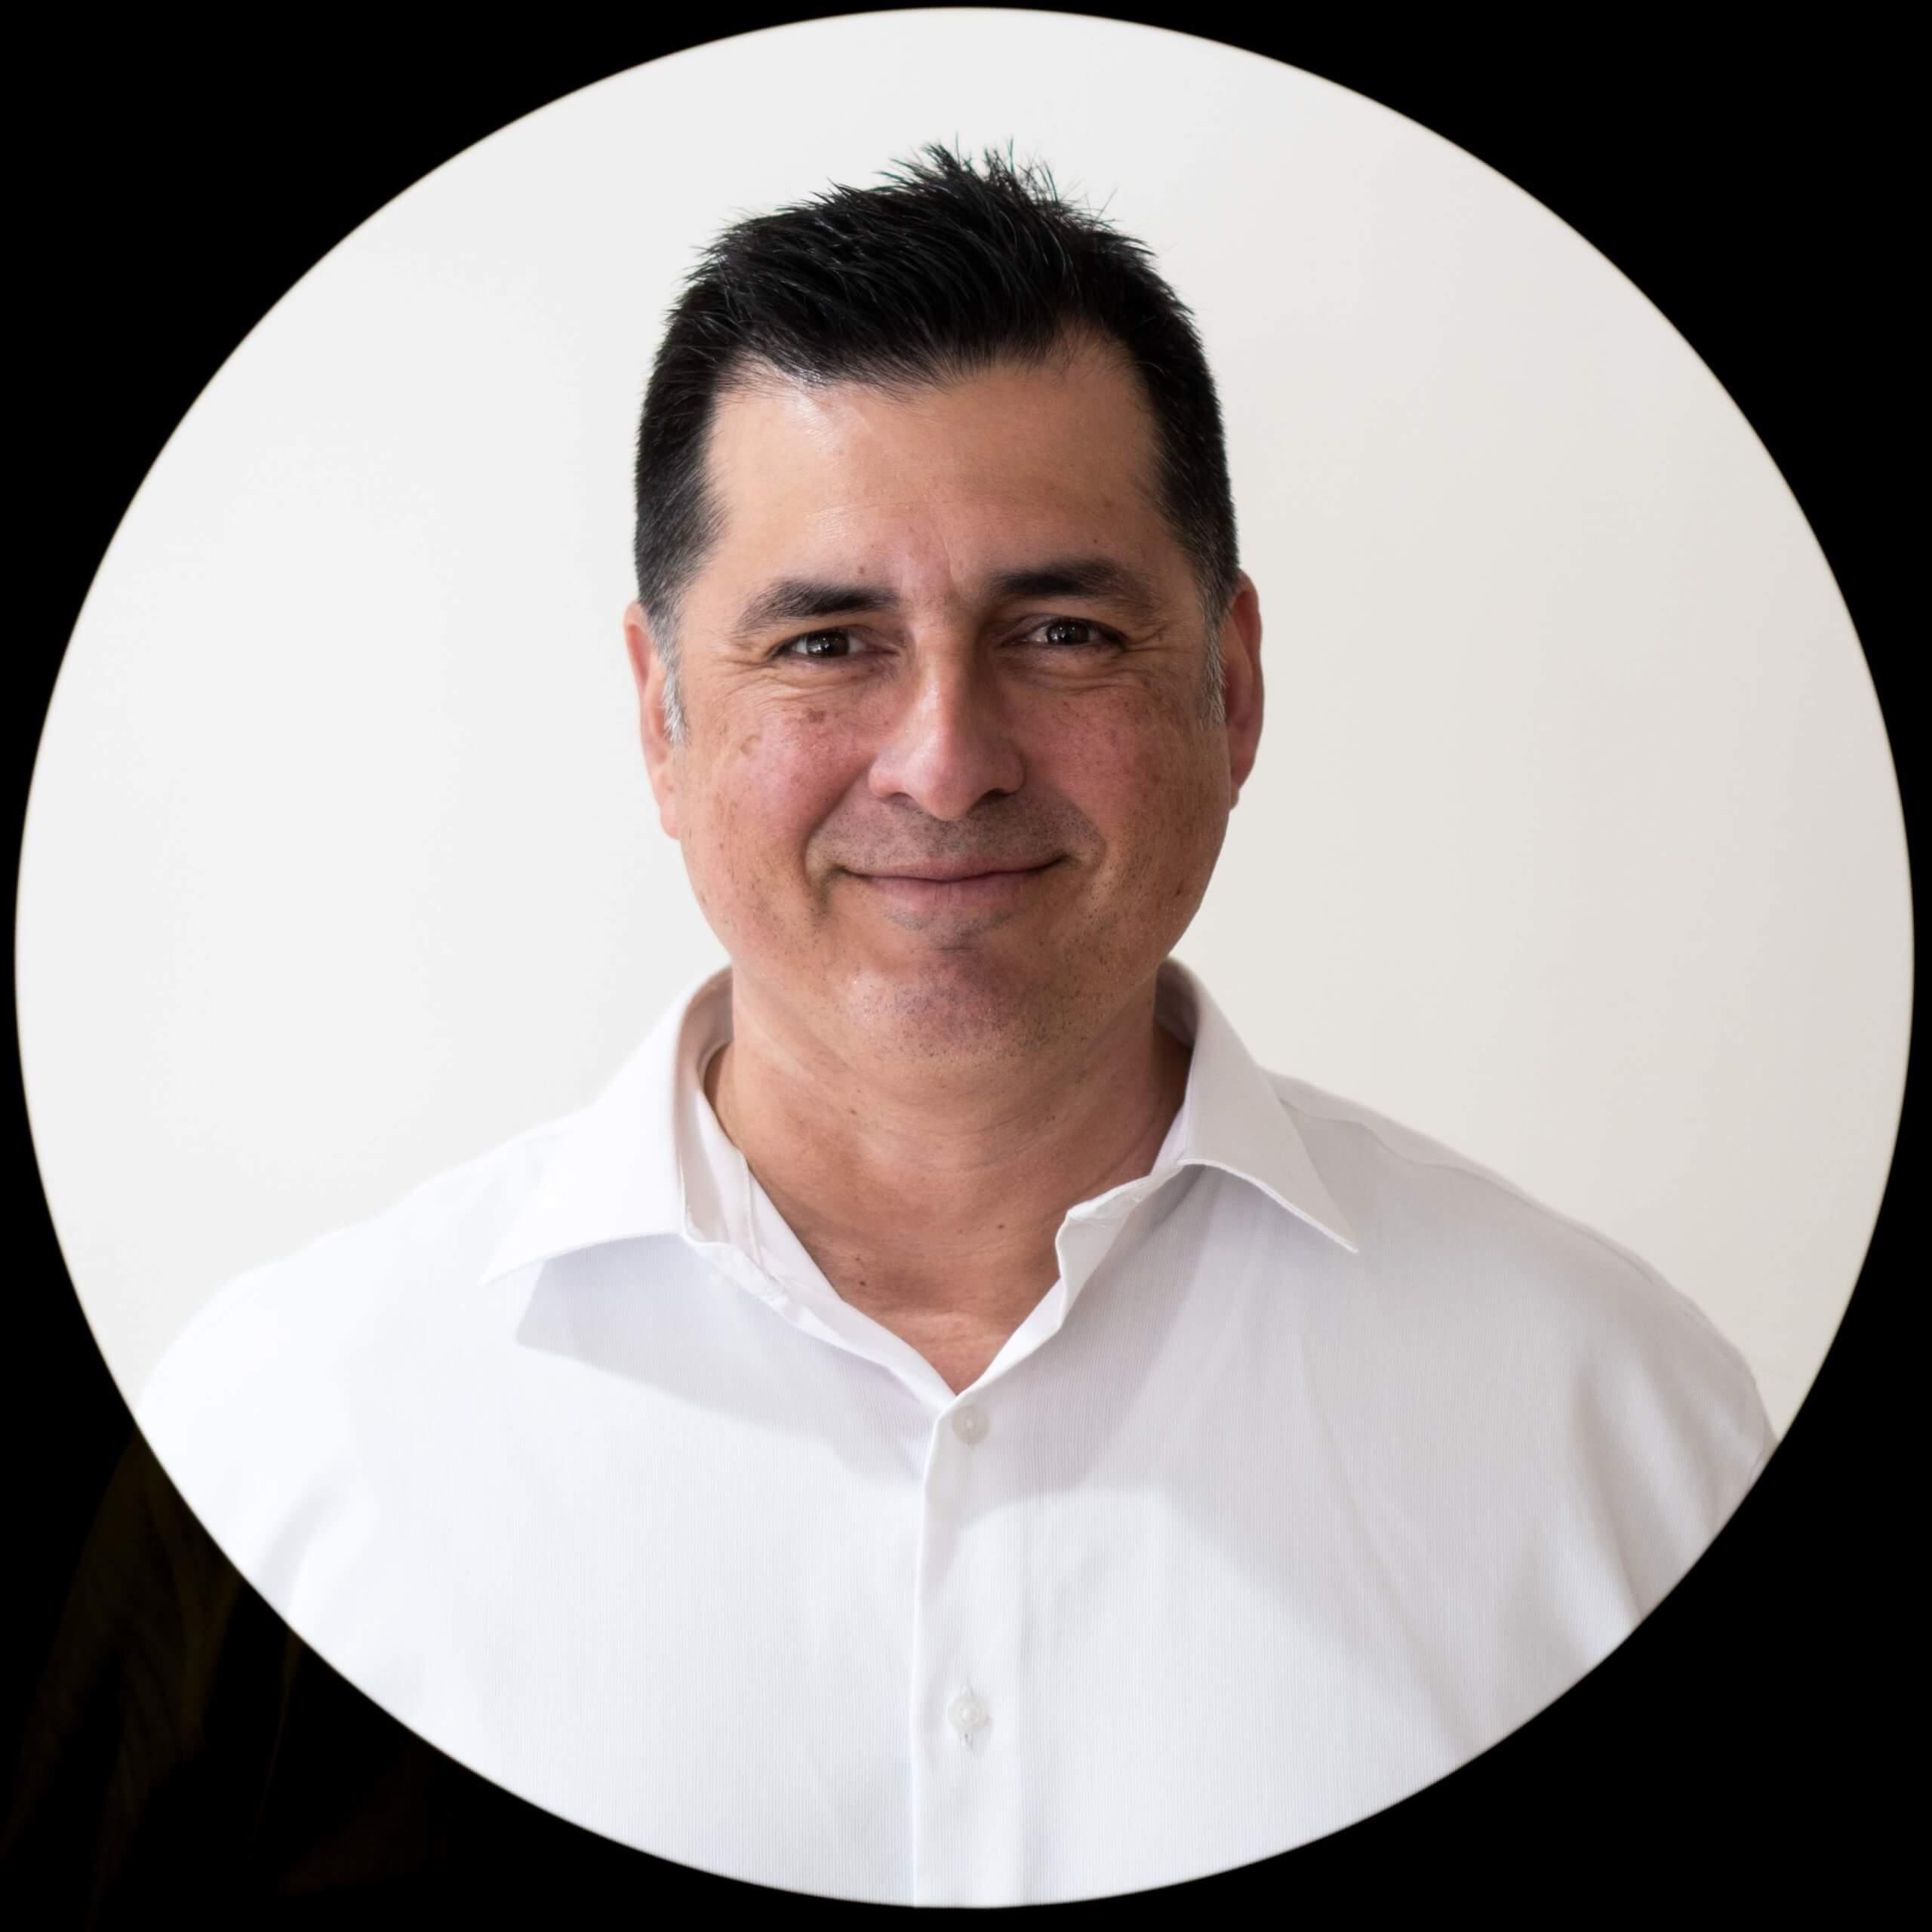 Marc Pereida